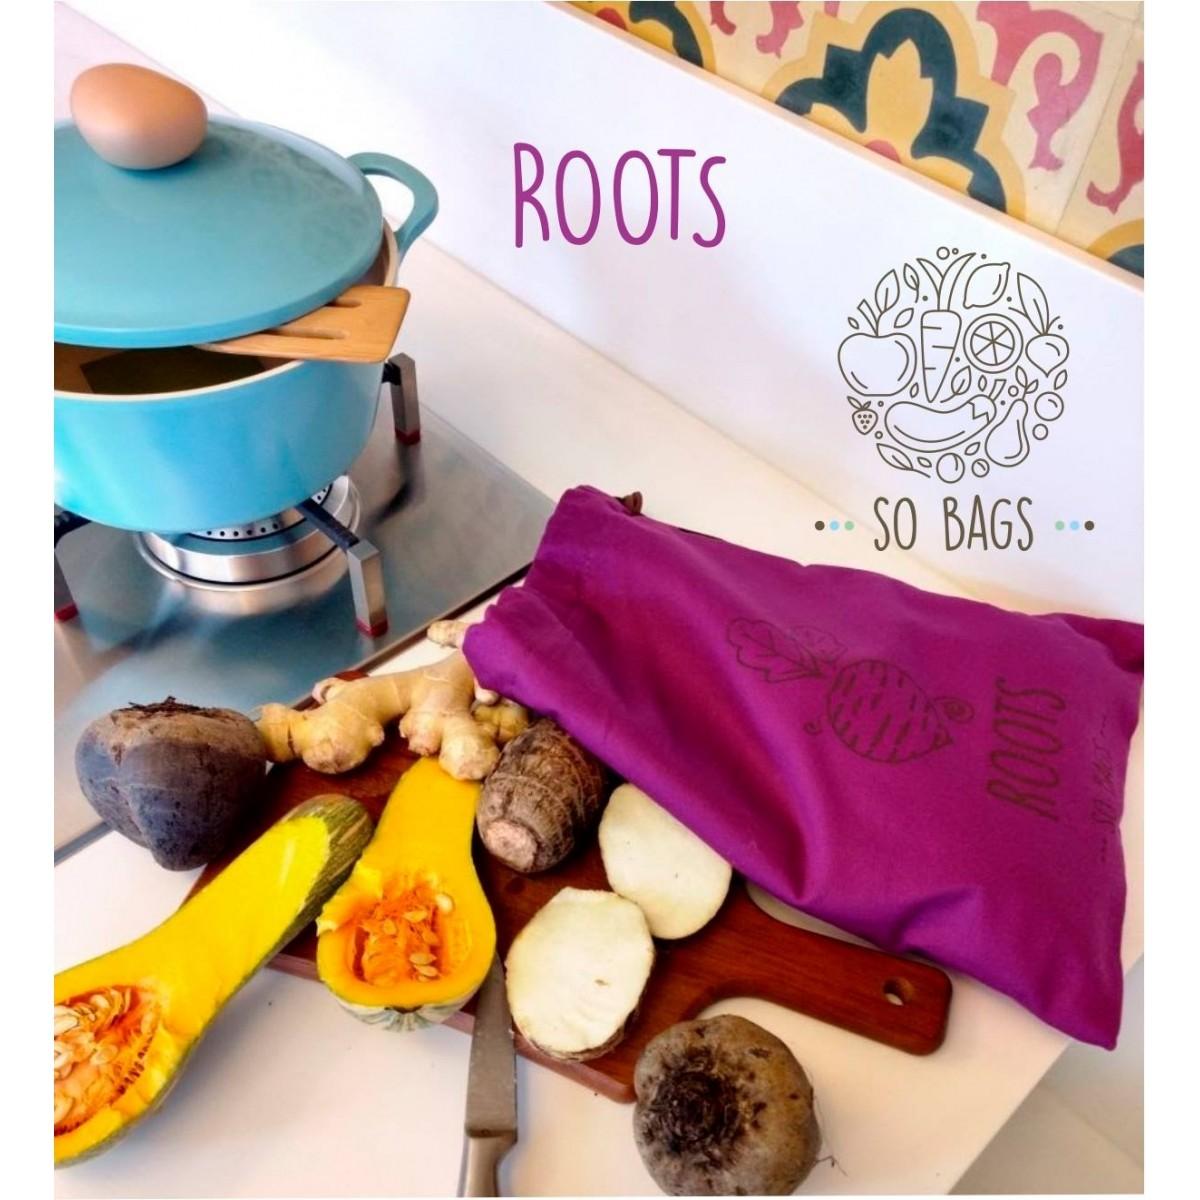 Sacola para legumes Sobags Roots